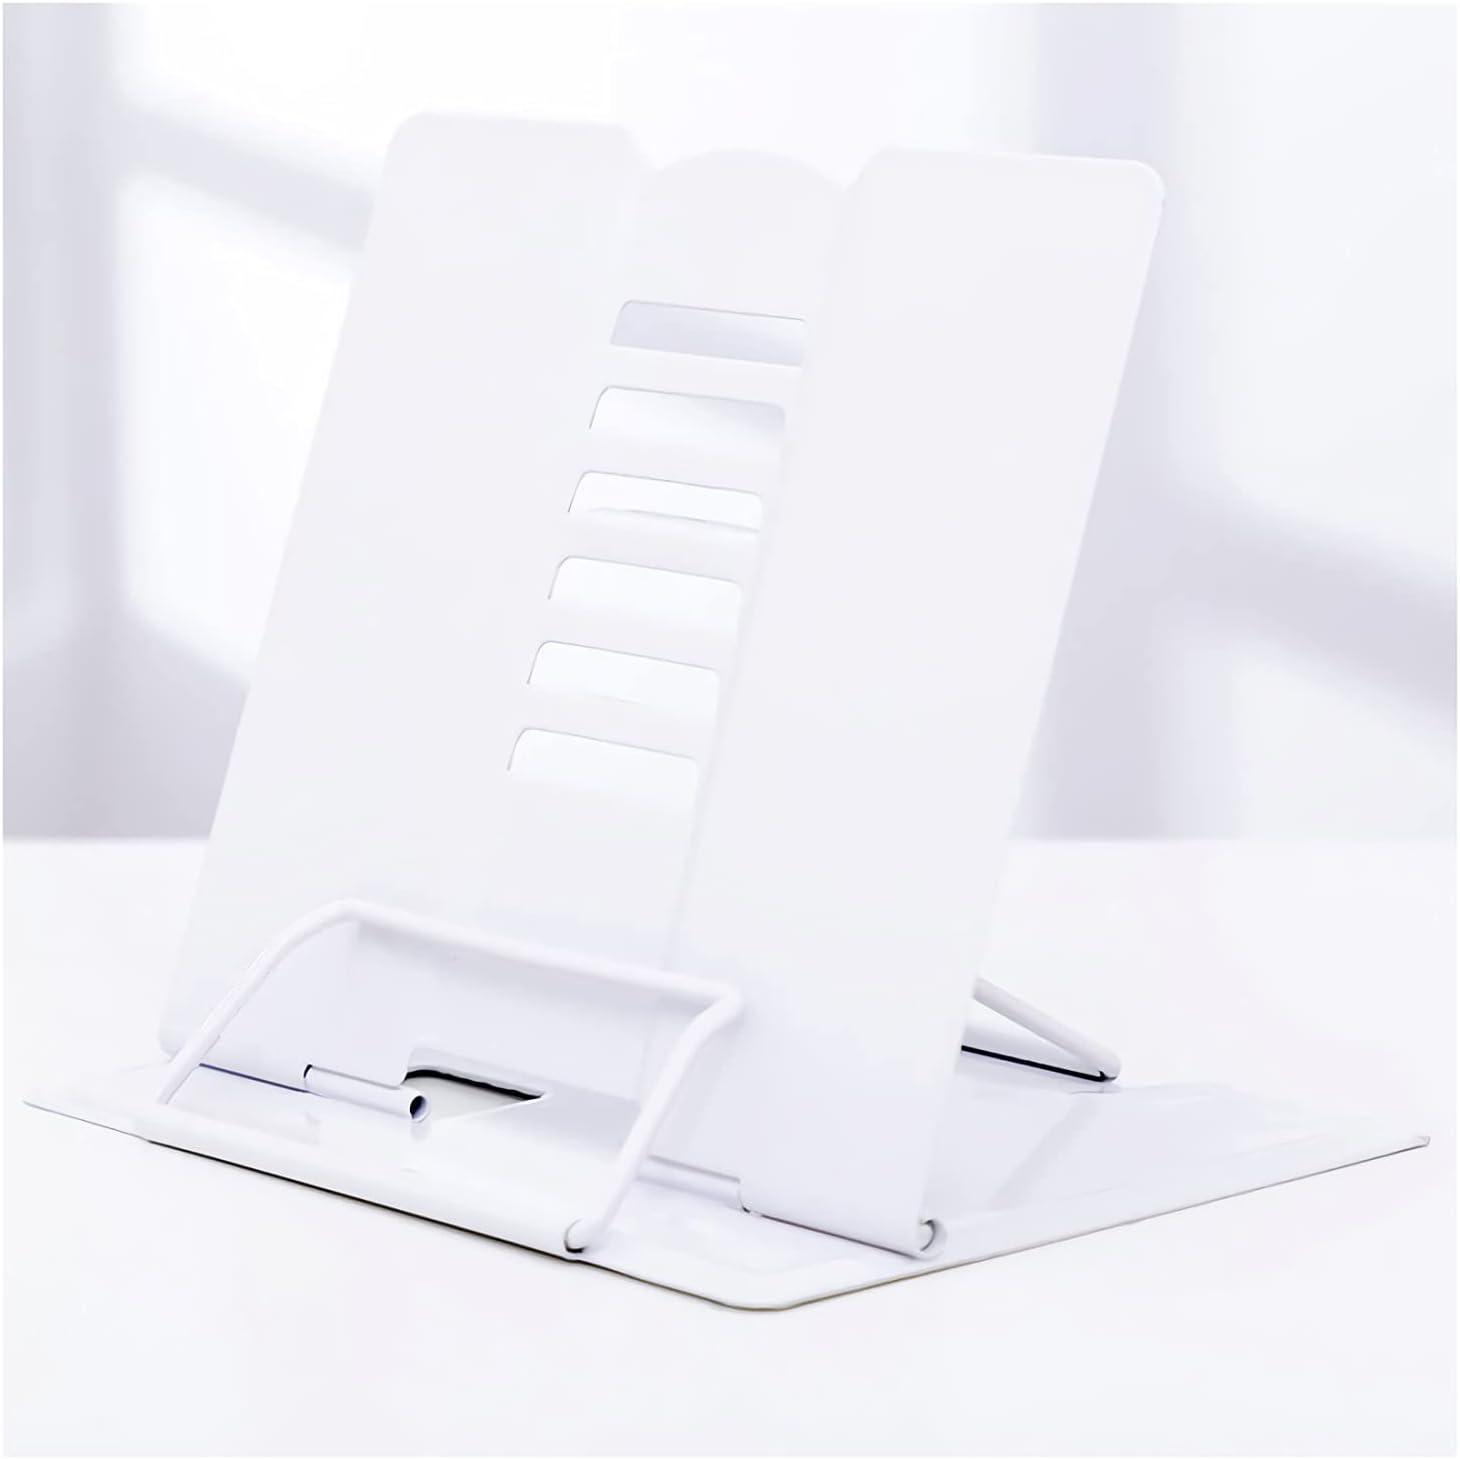 hongbanlemp Cookbook Award Stand Desktop Me All stores are sold Book Document Holder